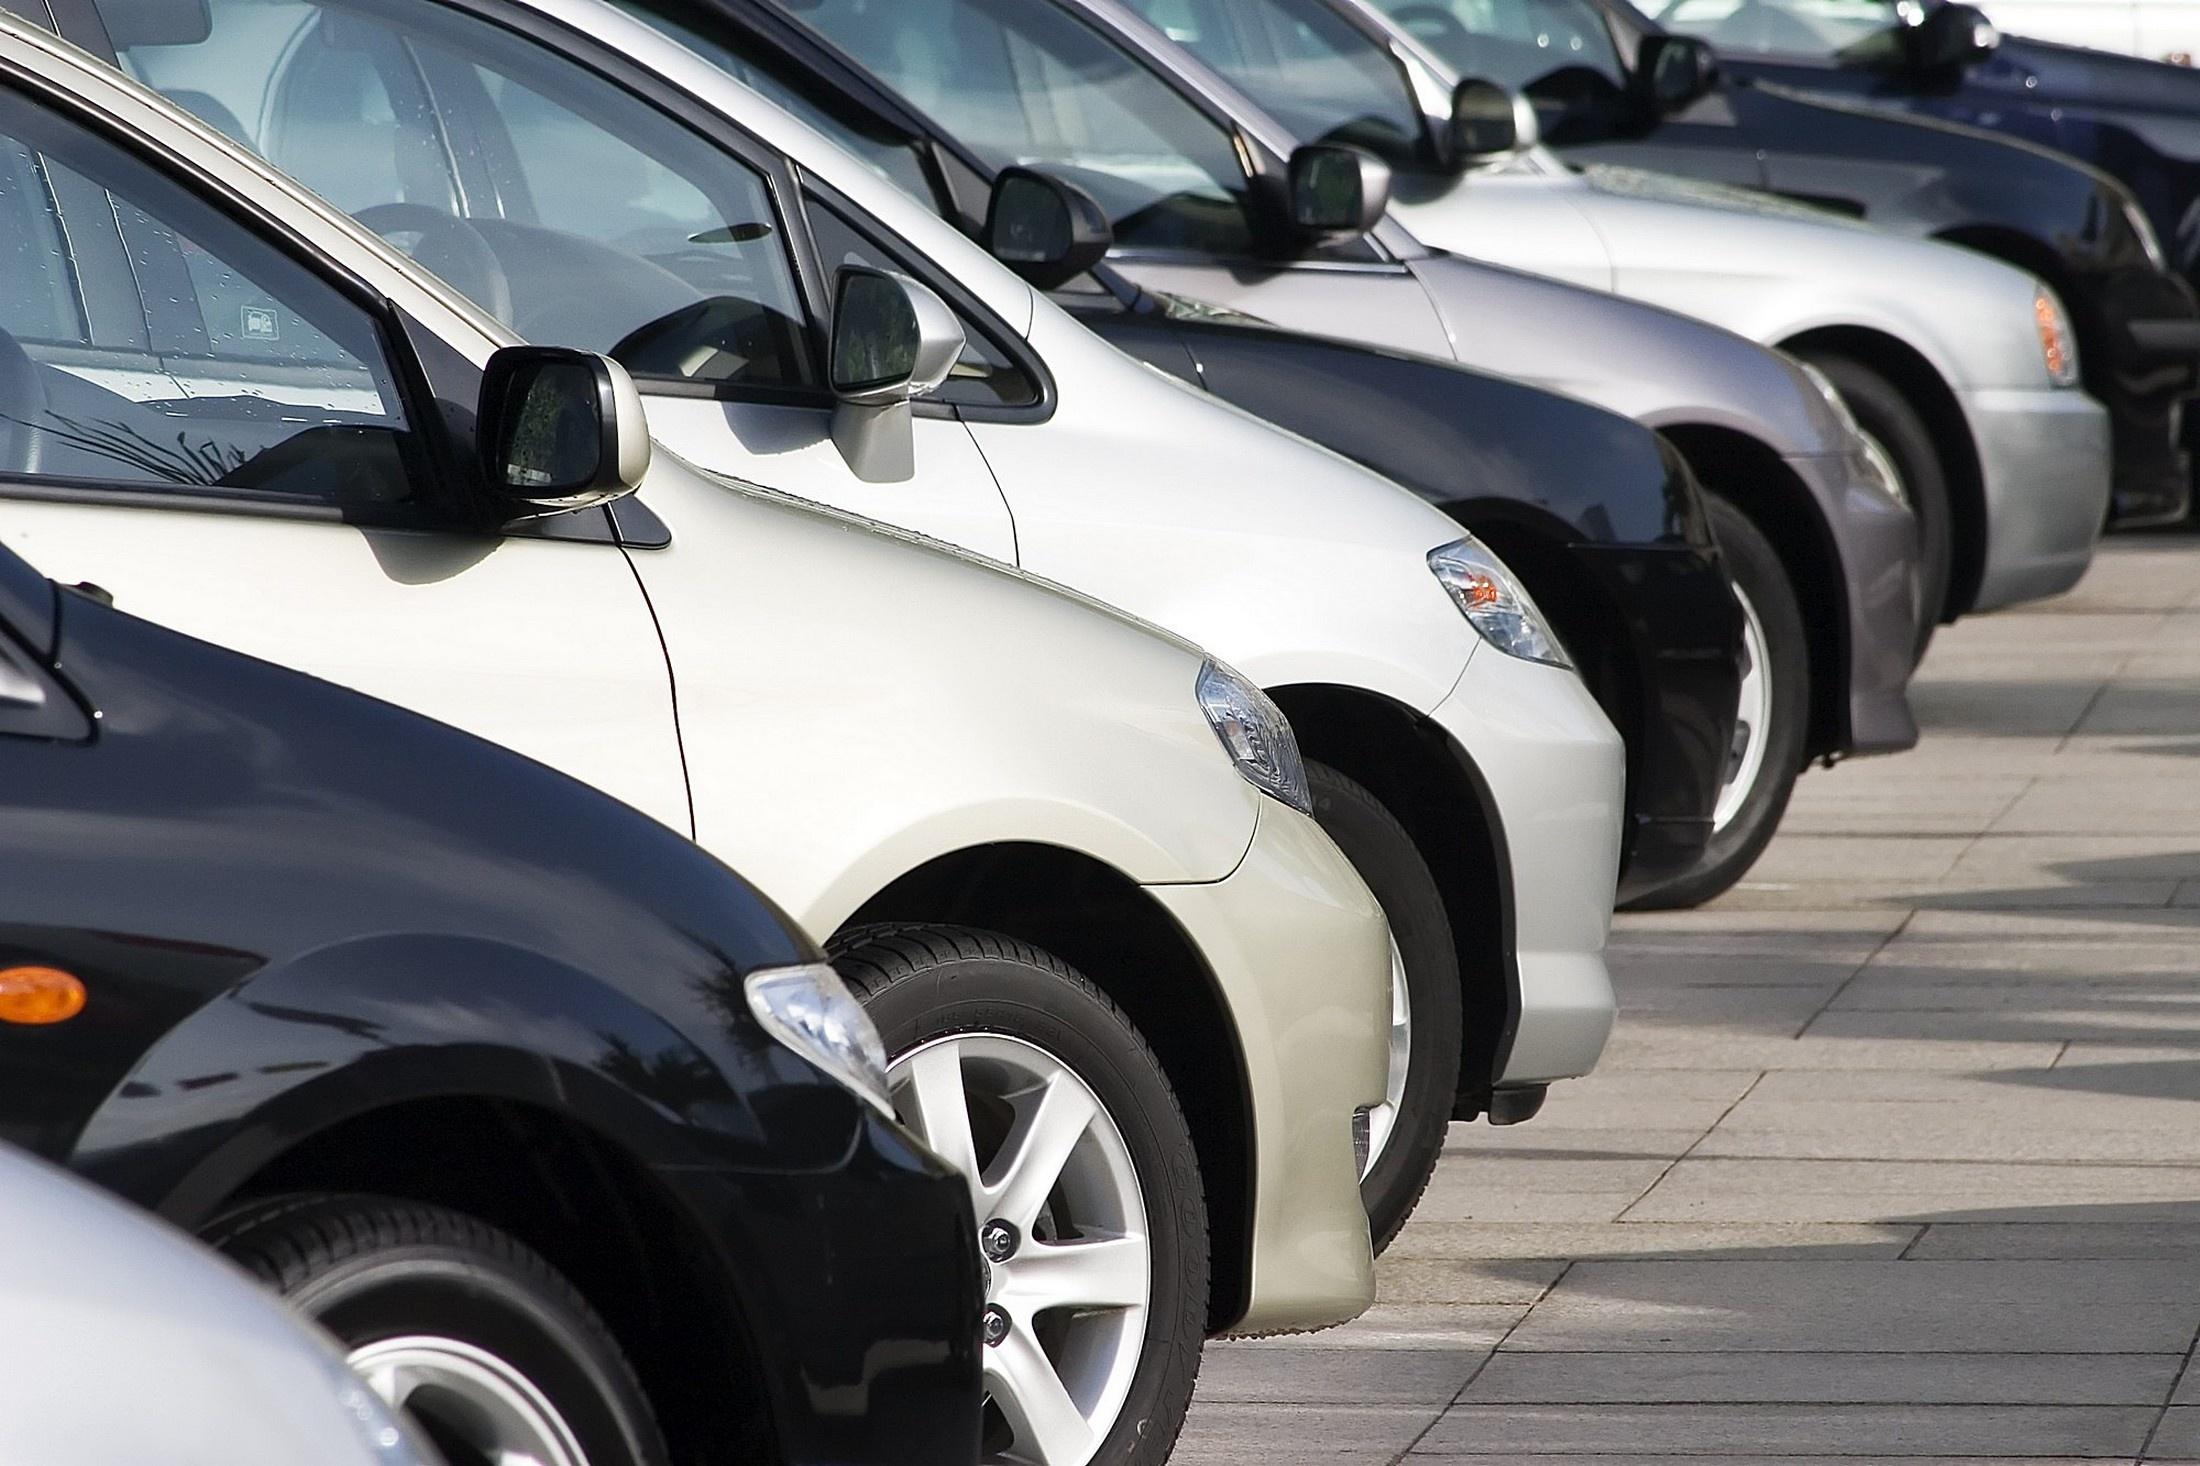 Justiça alemã autoriza cidades a proibir carros a diesel